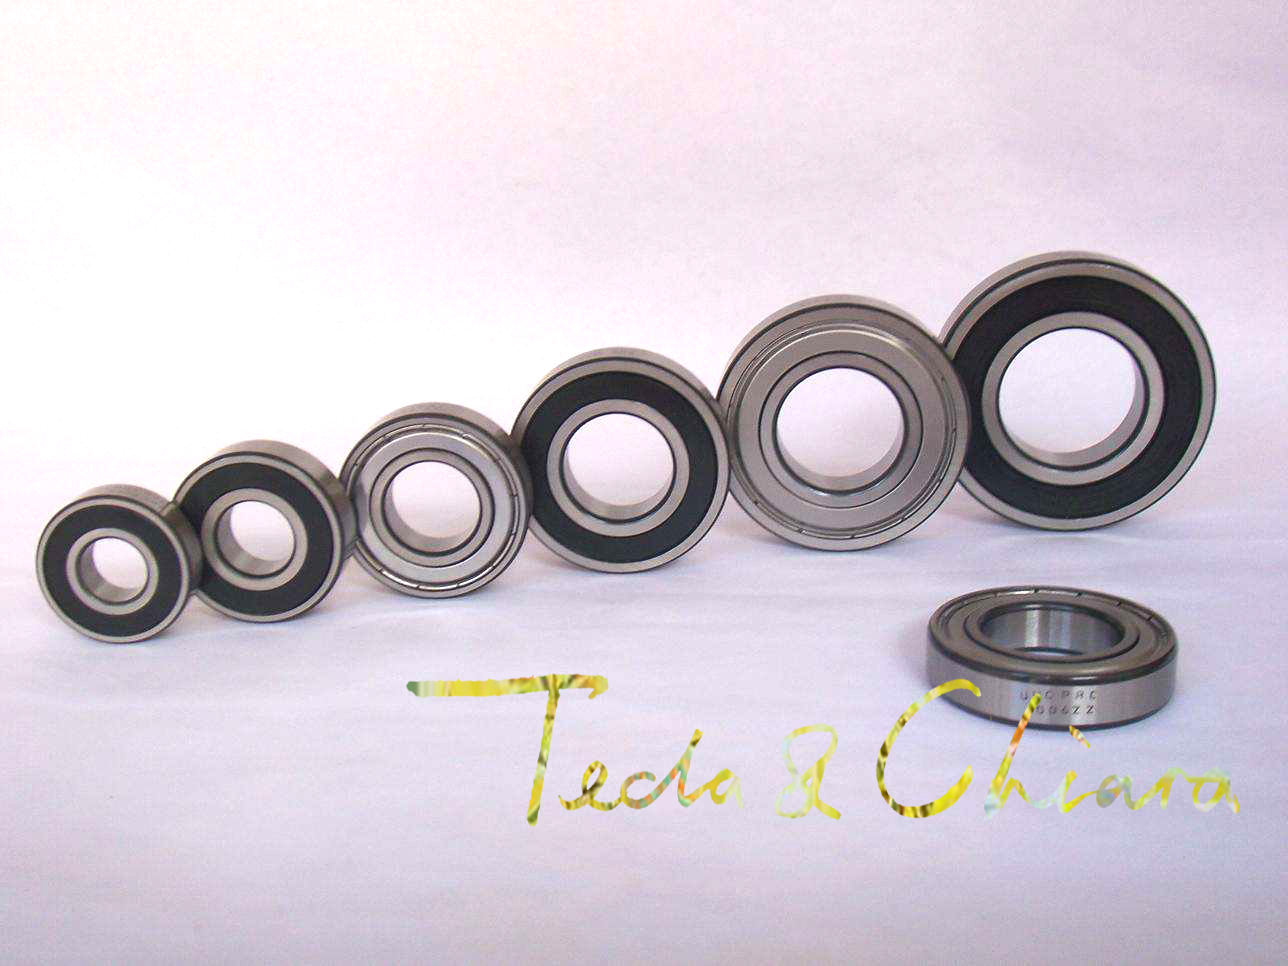 687 687ZZ 687RS 687-2Z 687Z 687-2RS ZZ RS RZ 2RZ 2000087 L1470ZZ Deep Groove Ball Bearings 7 X 14 X 5mm